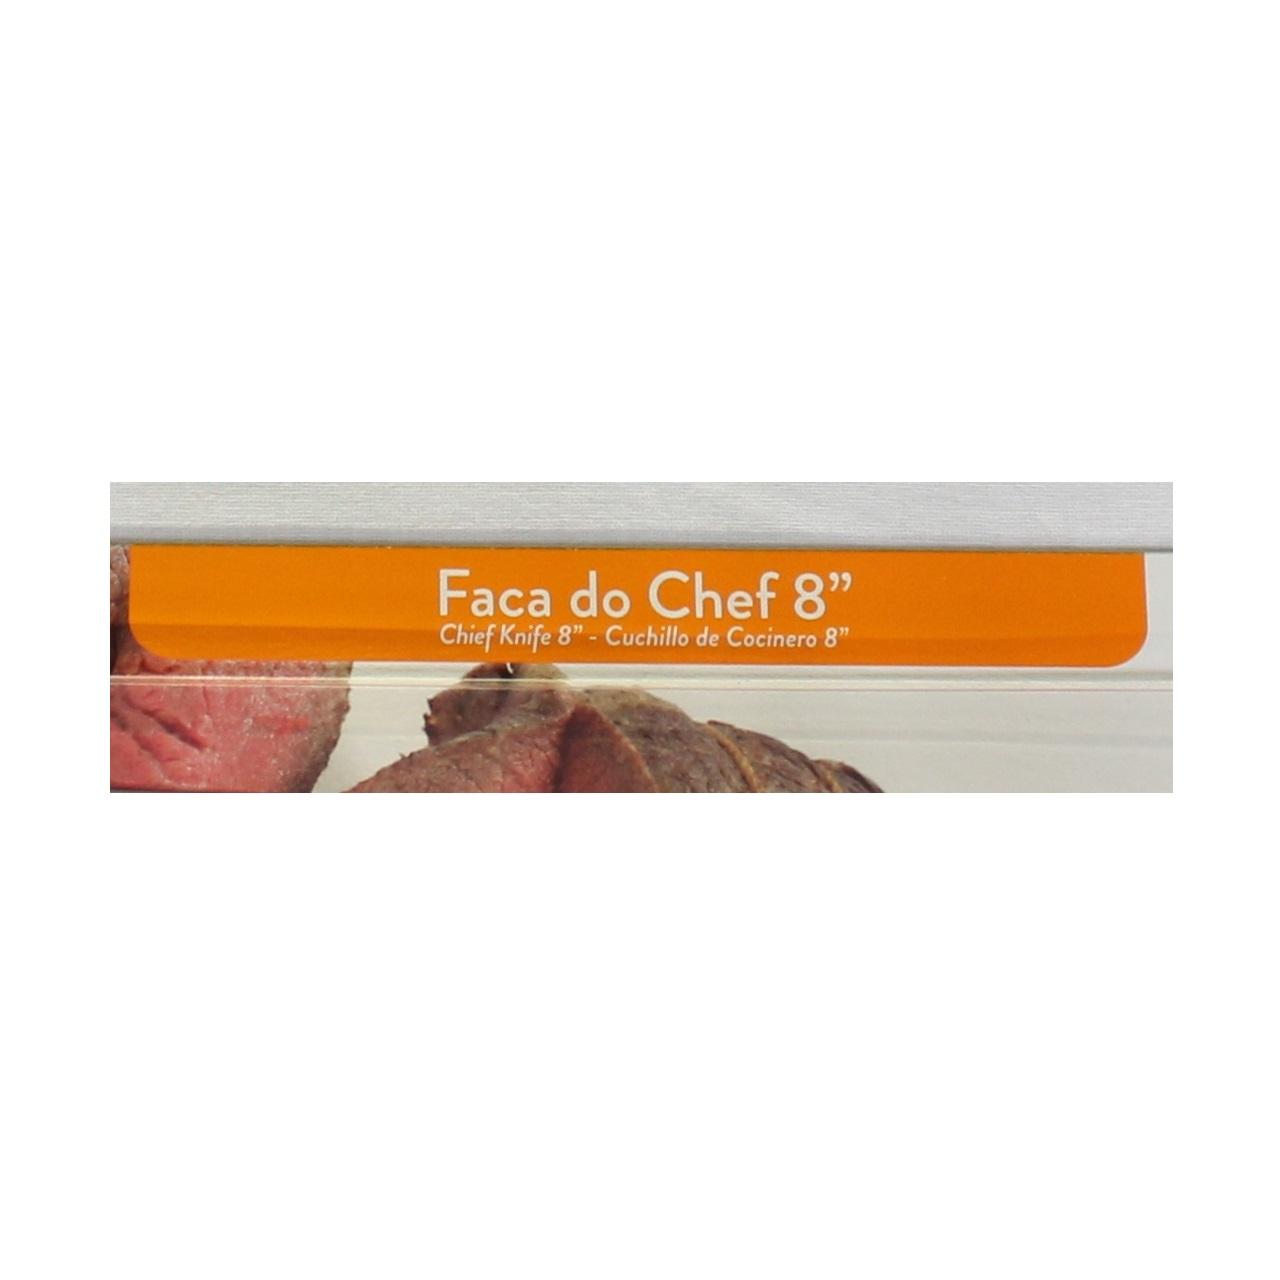 Faca 8 Official Knife Gastronomie MasterChef